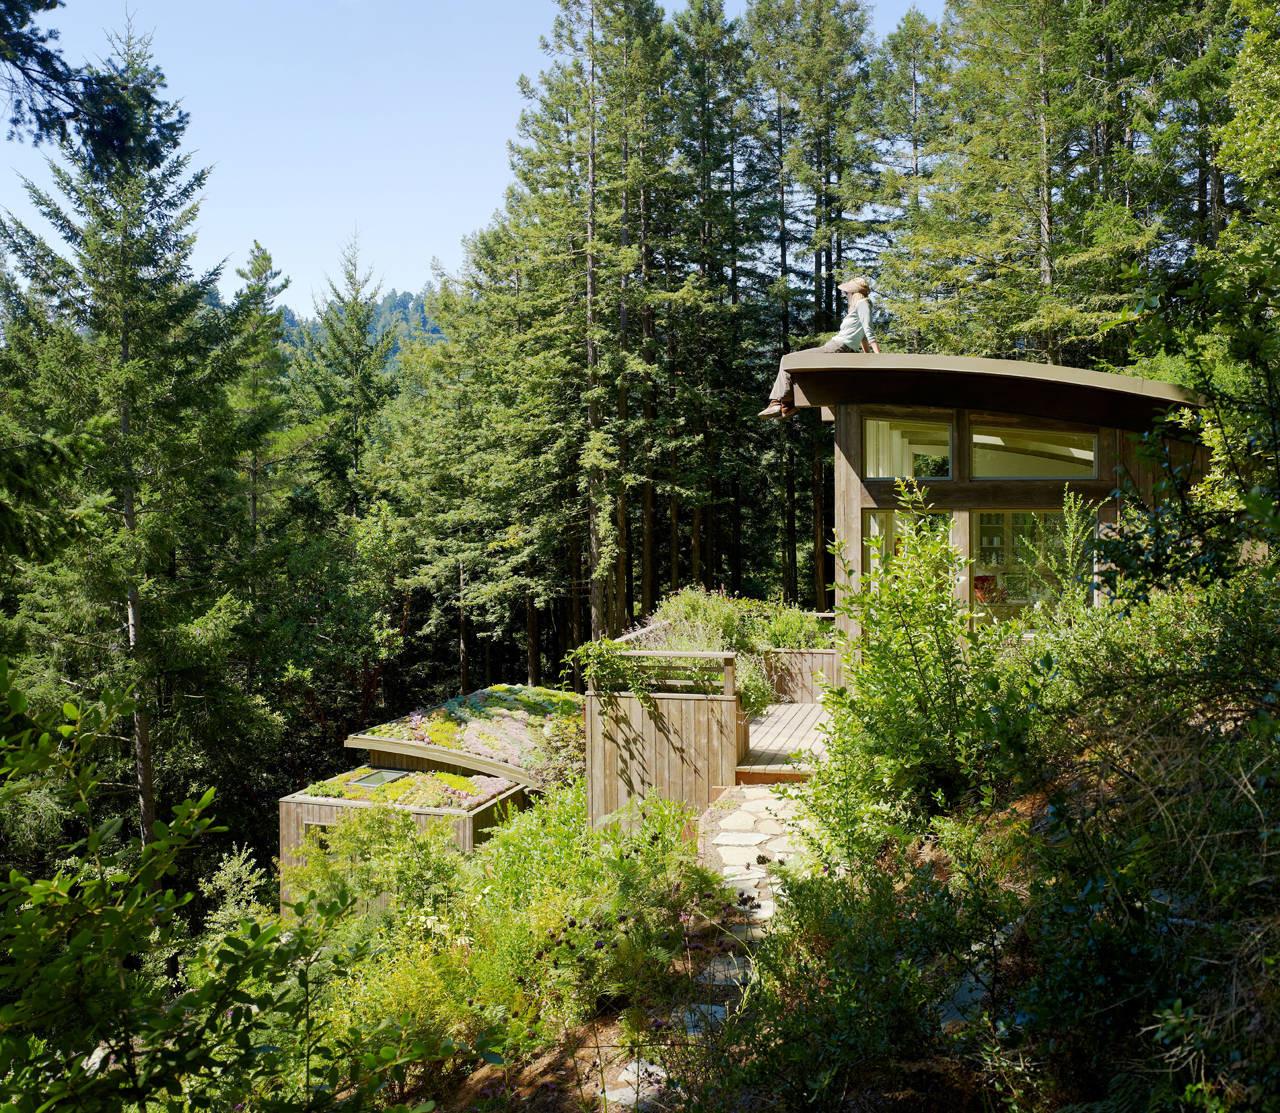 Mill Valley Cabins / Feldman Architecture, © Joe Fletcher